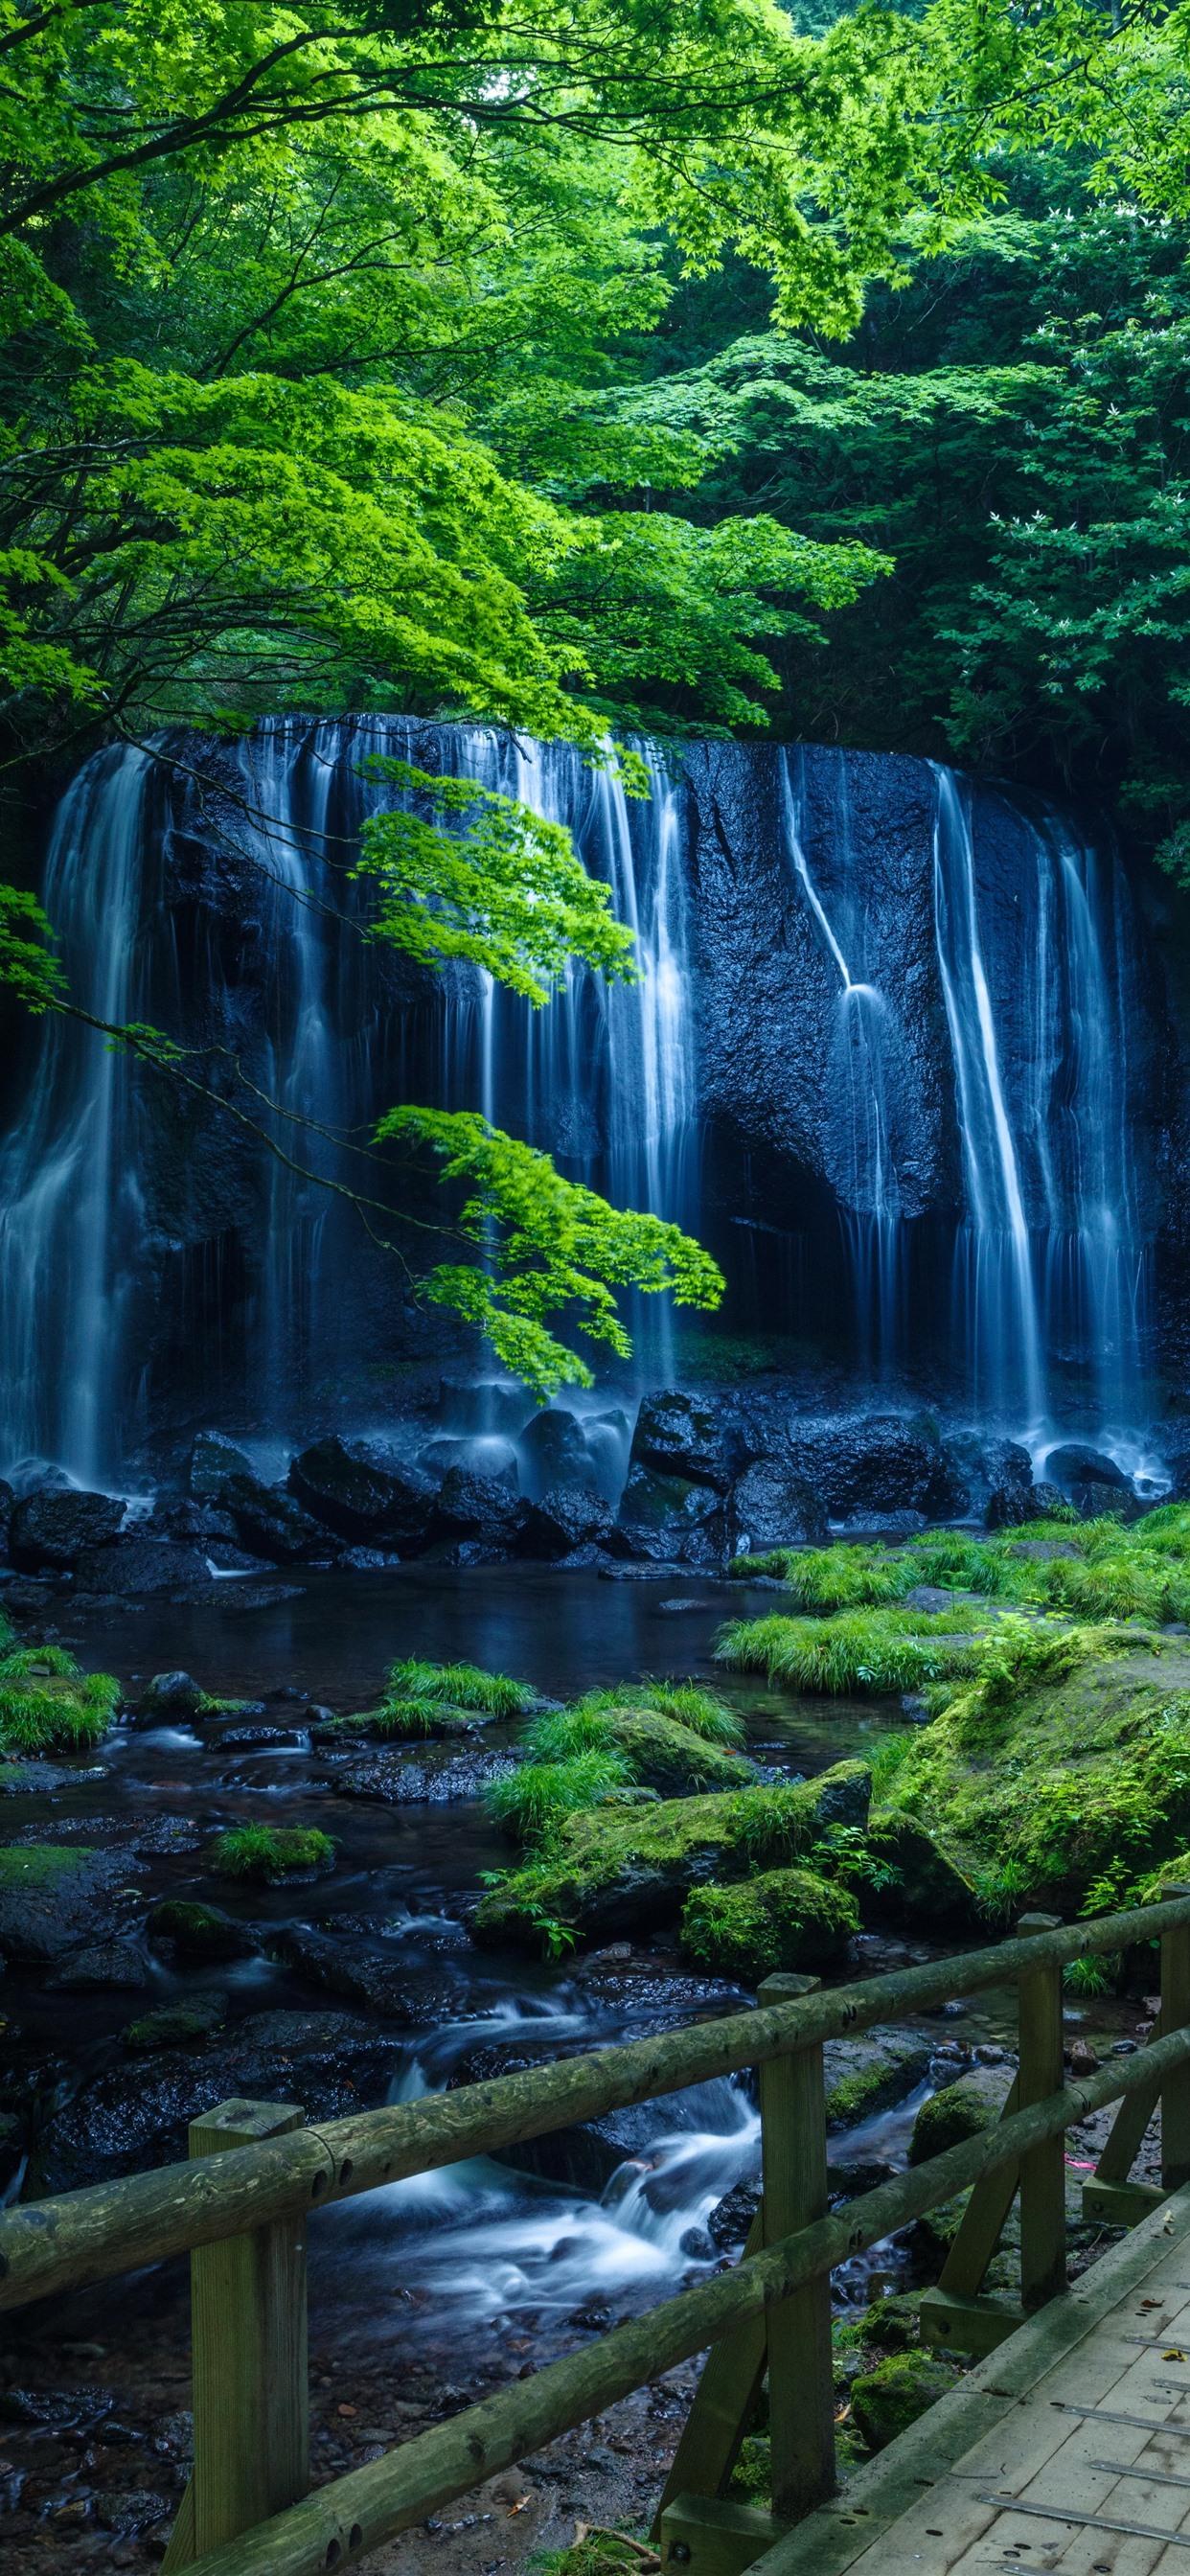 Waterfall Wallpaper Iphone Xs Max 1242x2688 Wallpaper Teahub Io